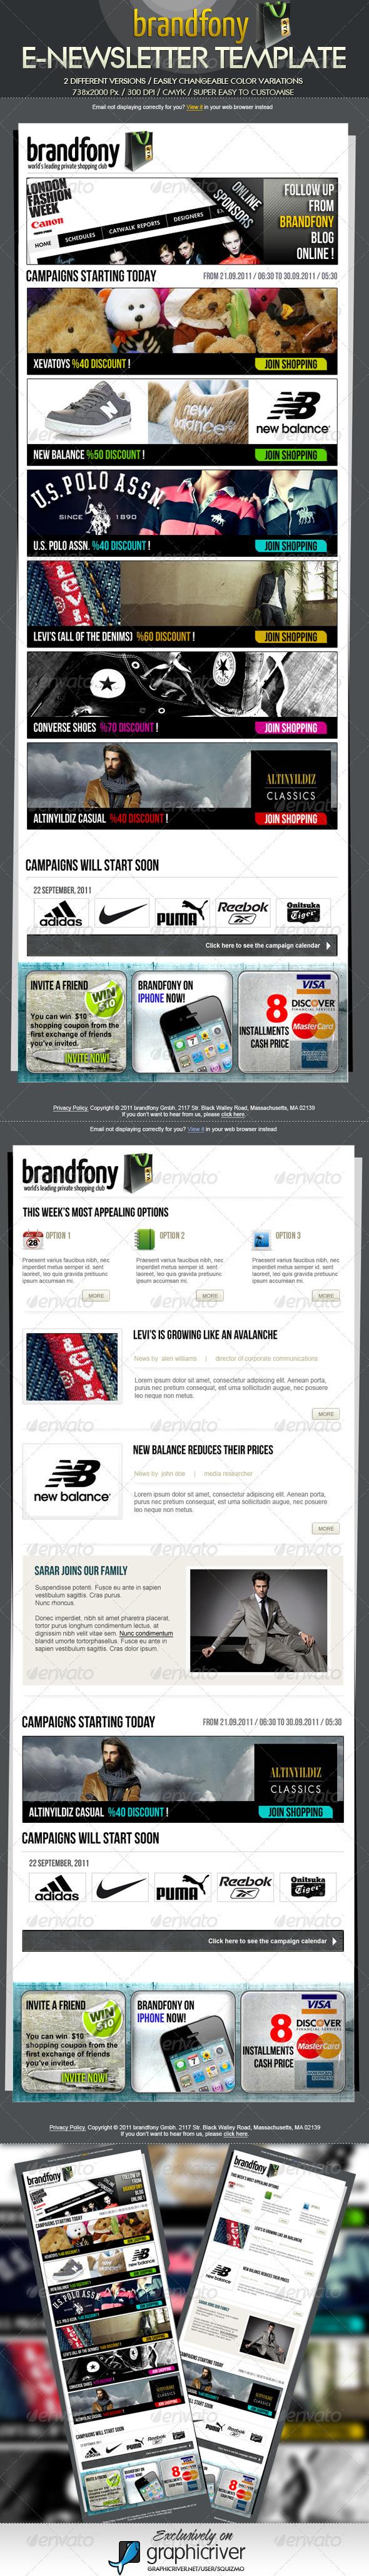 GraphicRiver Brandfony E-Newsletter Template 546362